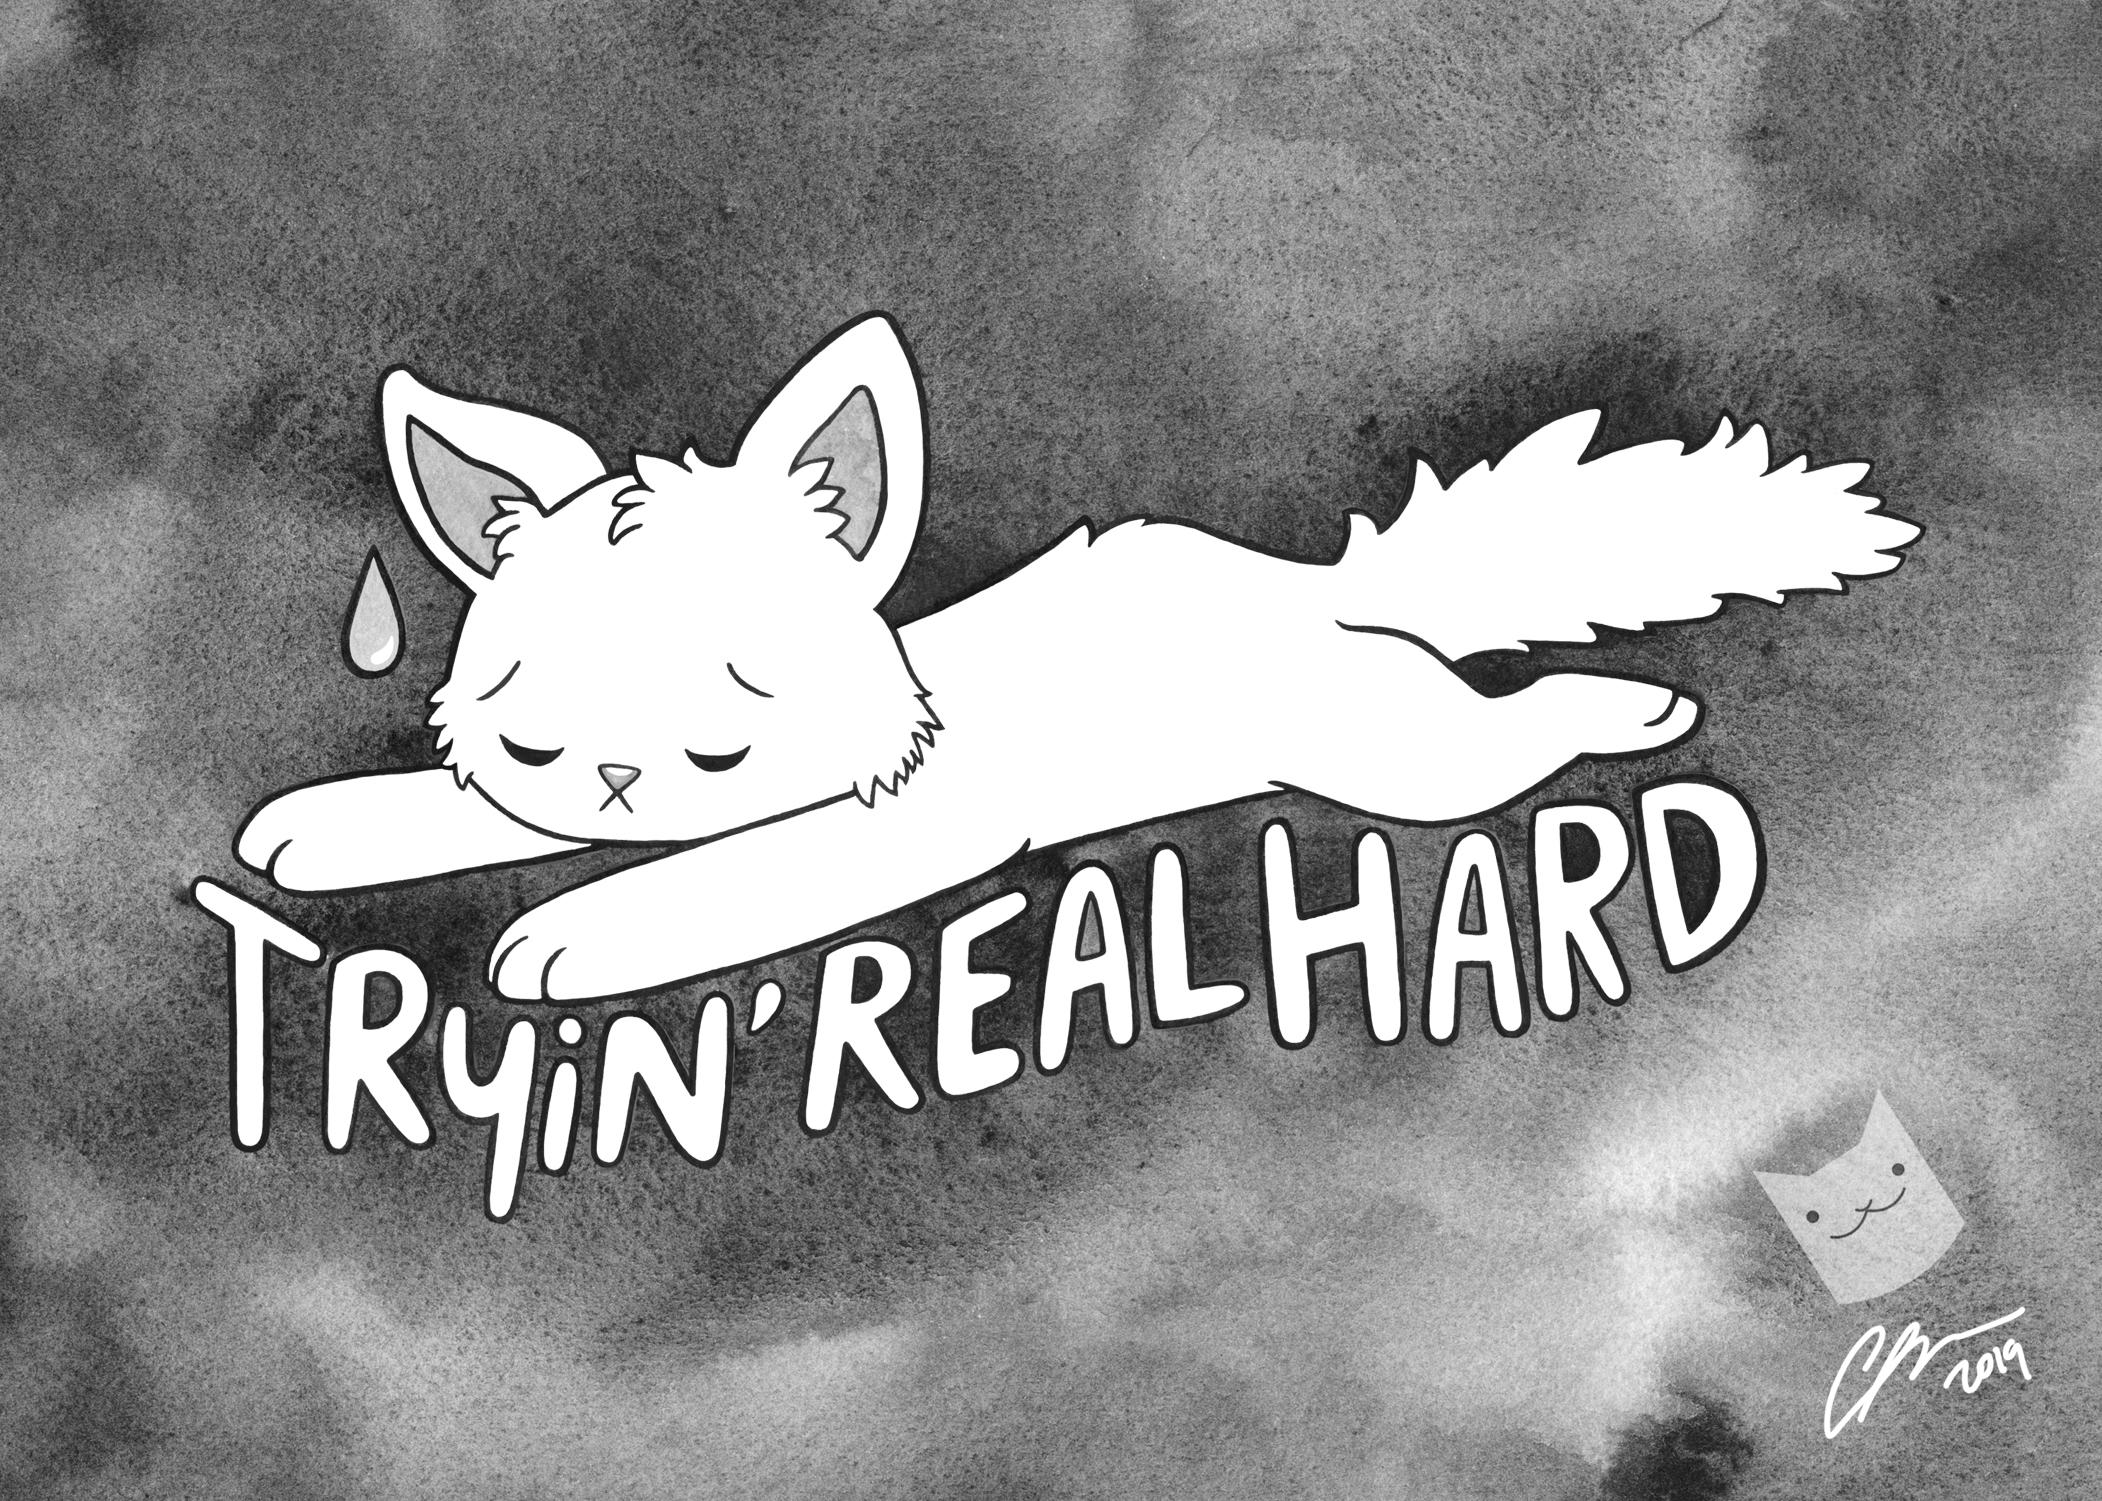 tryin real hard 5x7 watermark.jpg